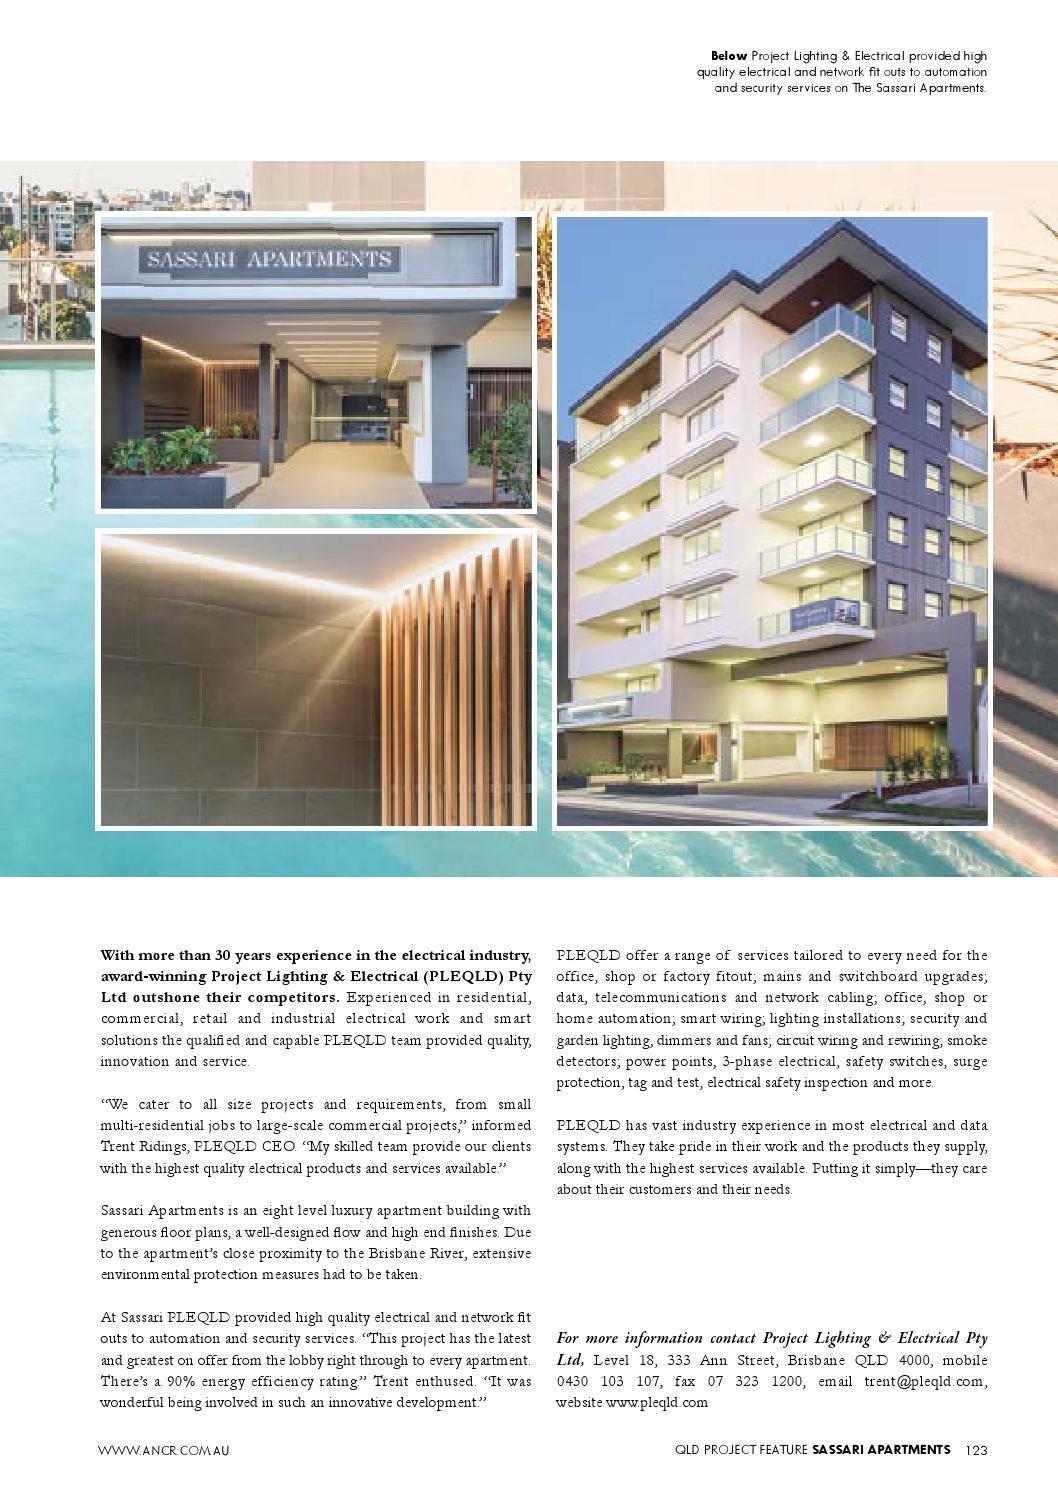 Peachy Australian National Construction Review By Trade Media Group Ptd Ltd Wiring Digital Resources Bemuashebarightsorg